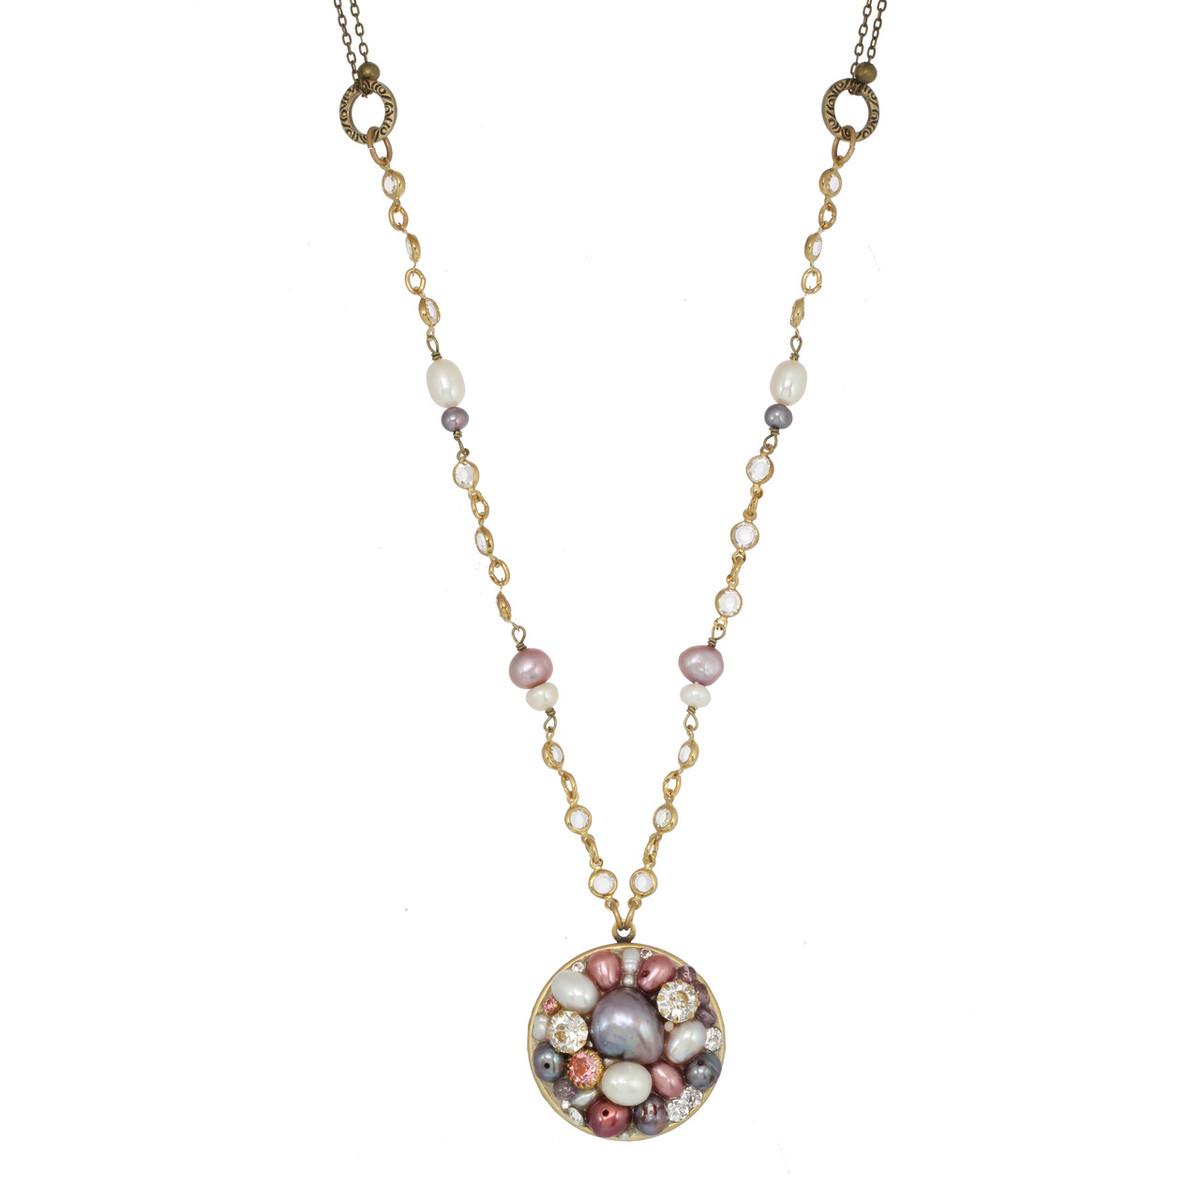 Michal Golan Jewelry Medium Round Pink Necklace